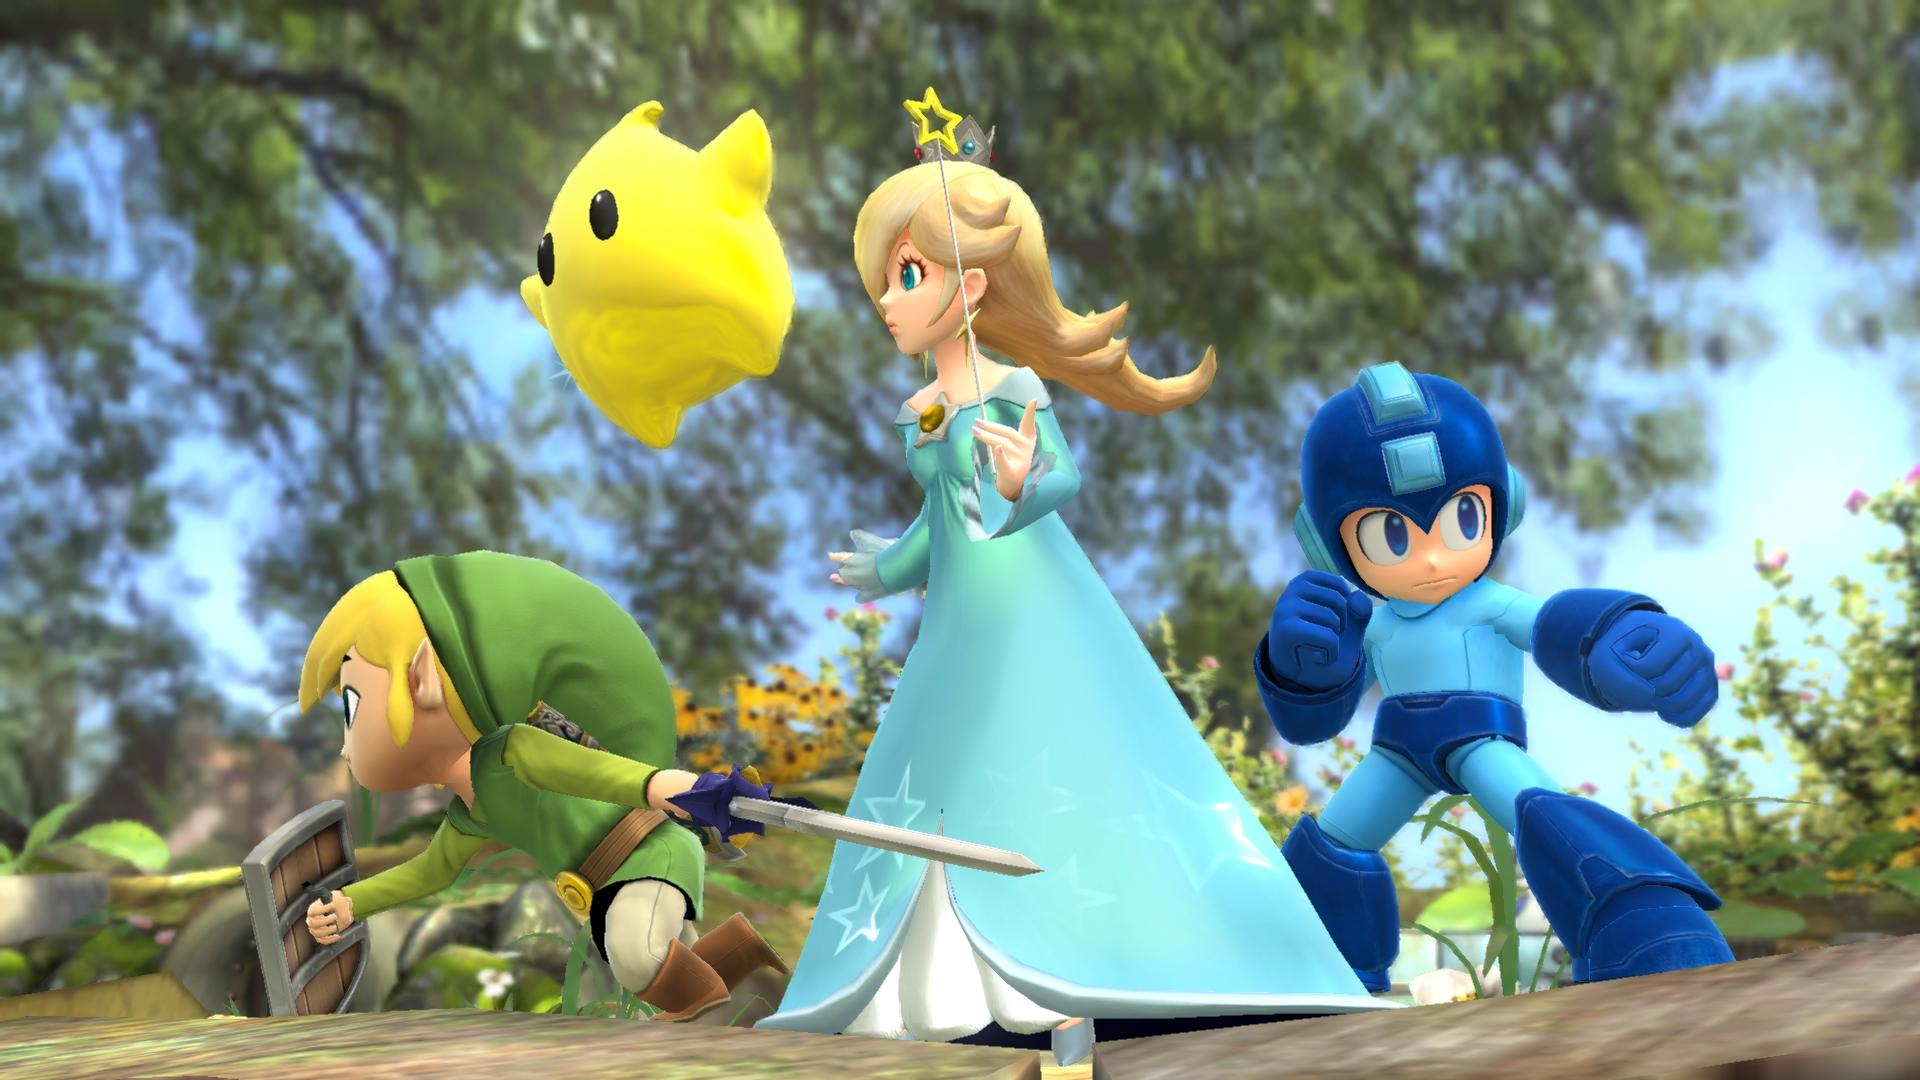 Super-Smash-Bros-3DS-Wii-U-Rosalina-Luma-Mega-Man-Toon-Link